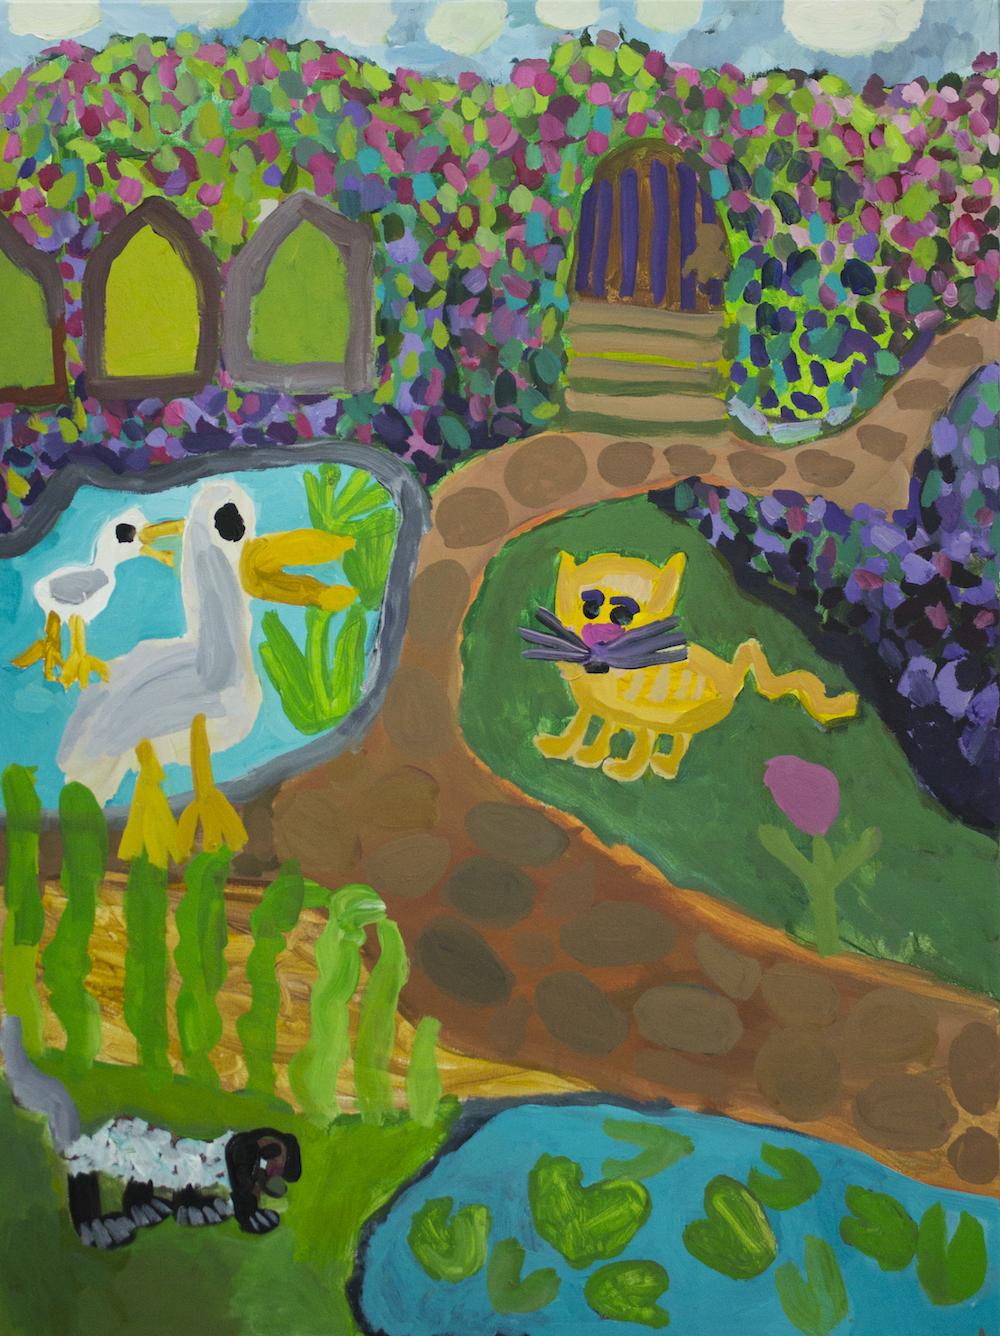 Nadia Lolas and Laura Jones, The Secret Garden (triptych), 2016, oil on canvas